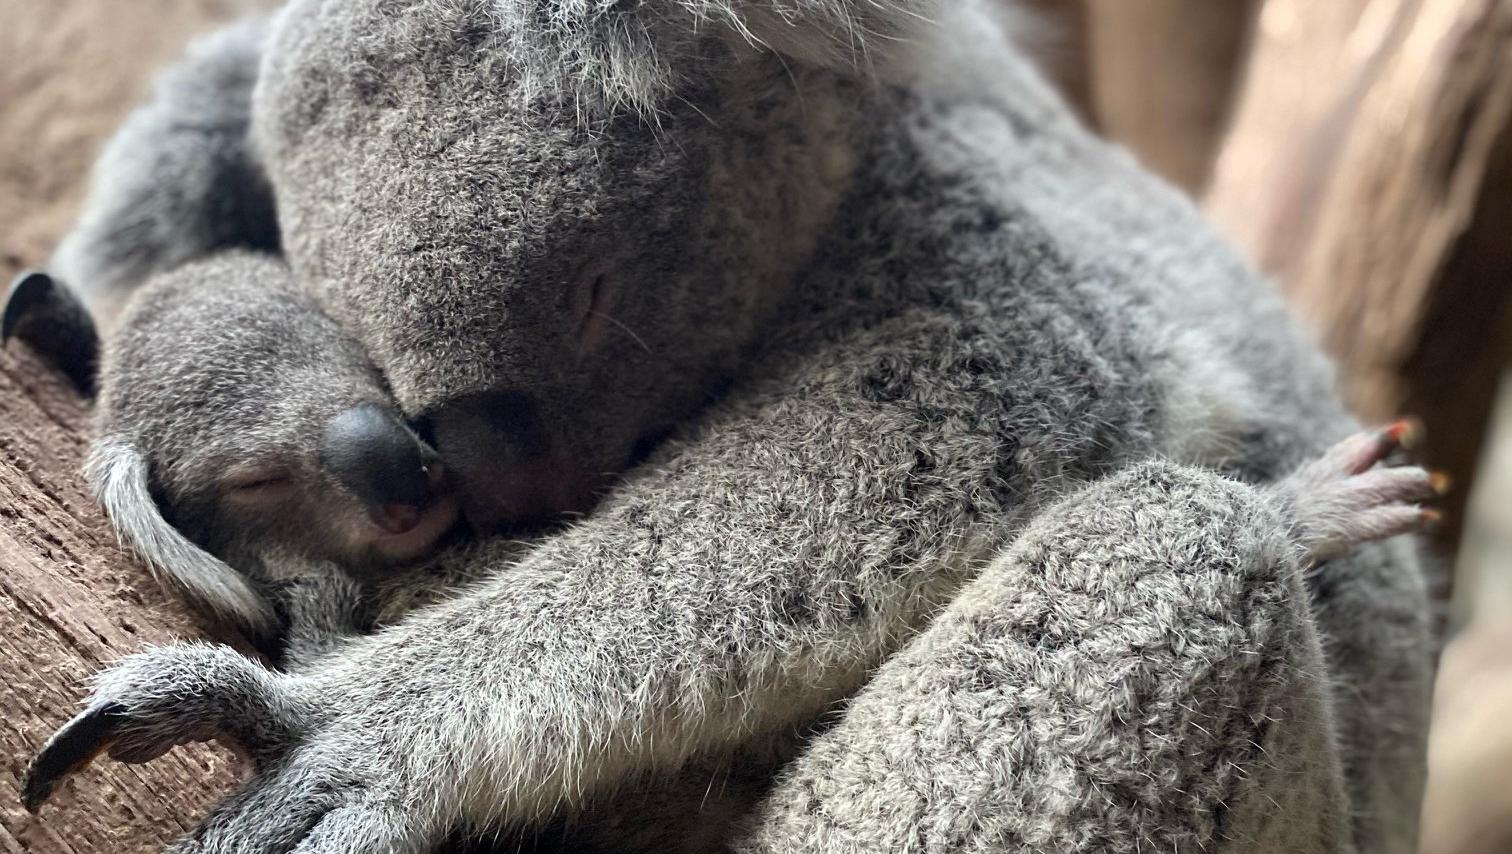 Koala-Mama Mandie kuschelt mit ihrem Baby im Zoo Leipzig. Foto: Zoo Leipzig.